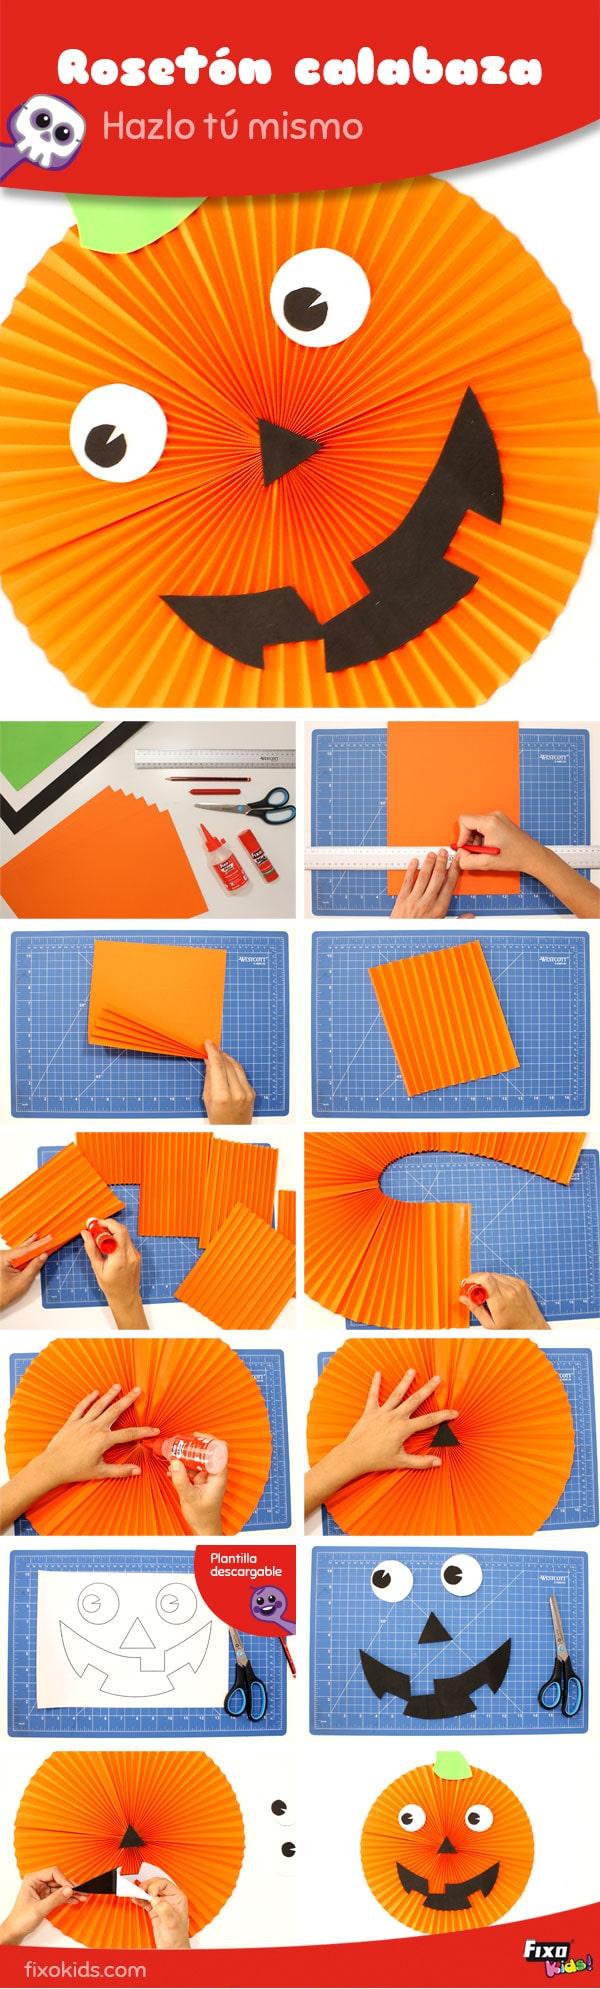 tutorial paso a paso calabaza de papel de halloween